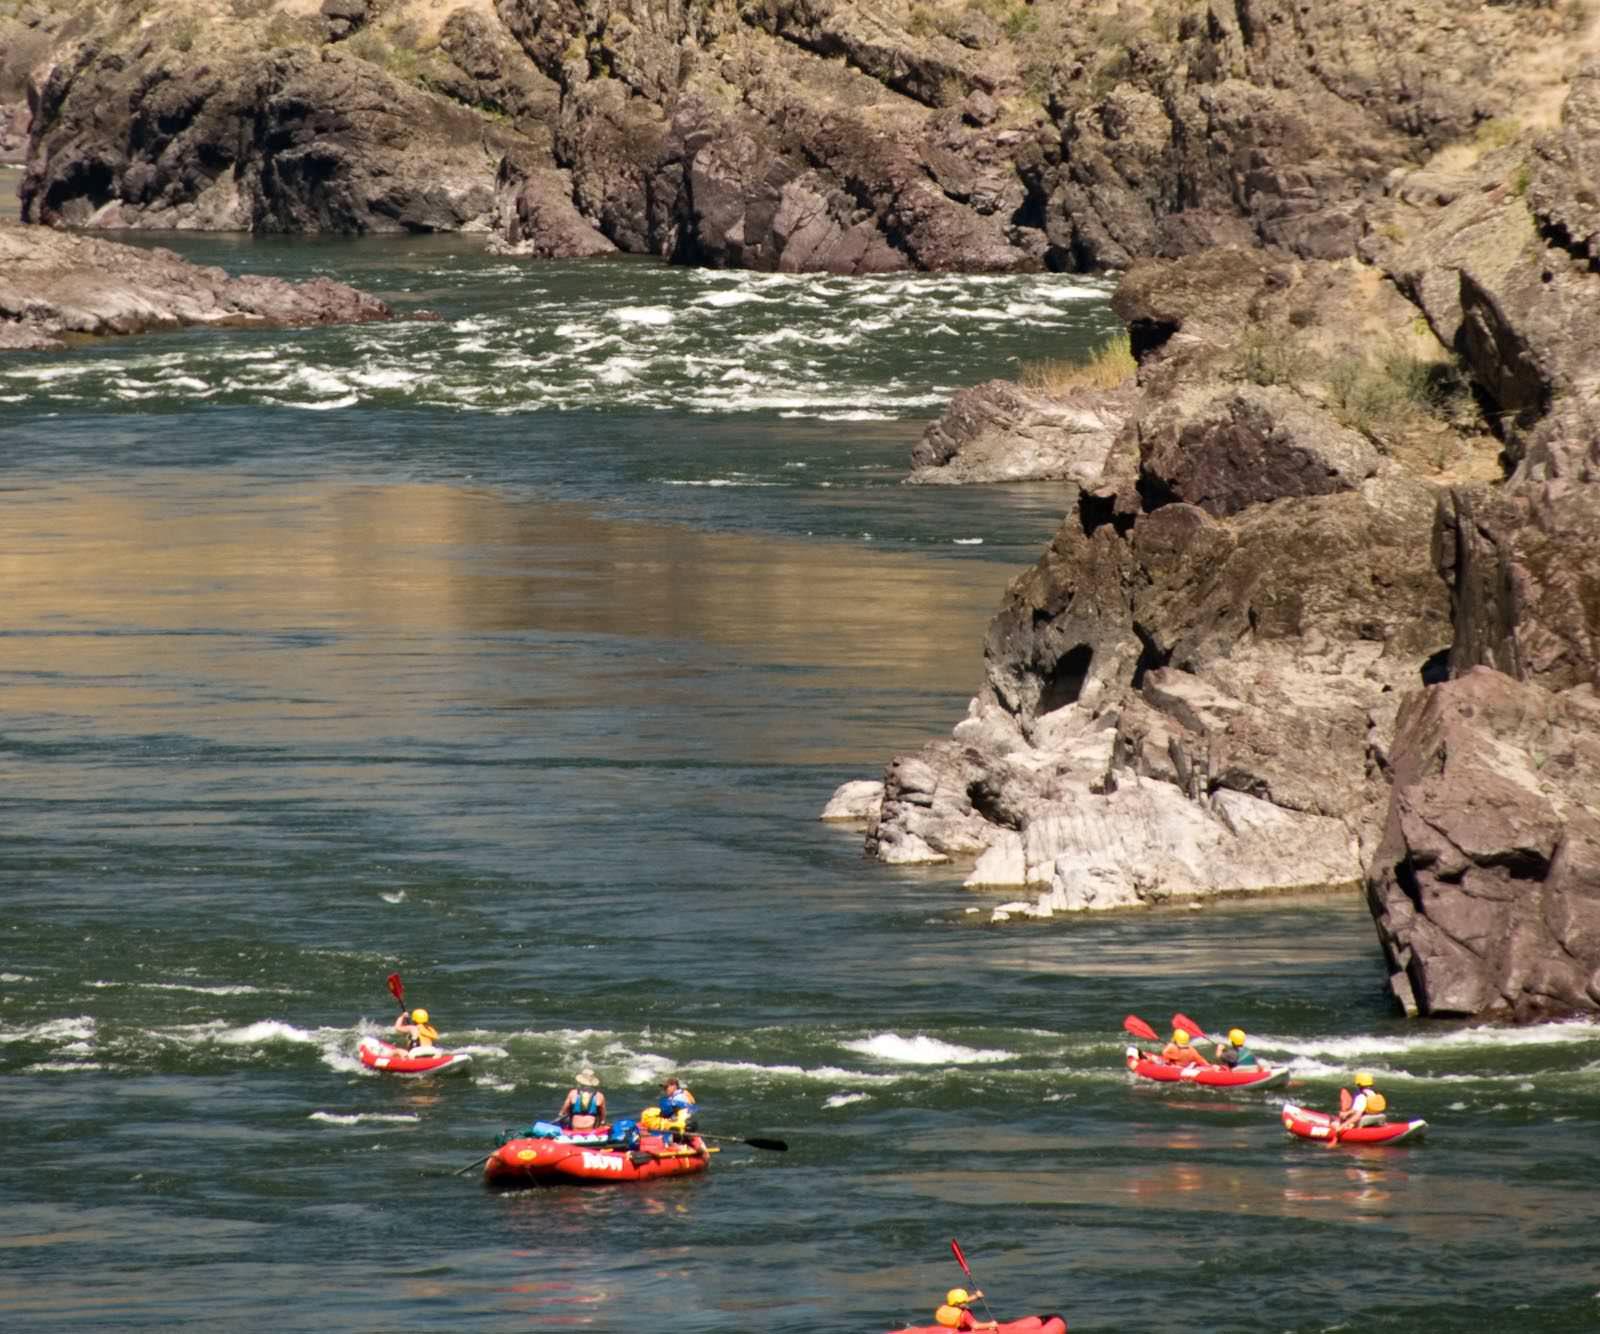 Lower Salmon River Rafting Trip In Idaho